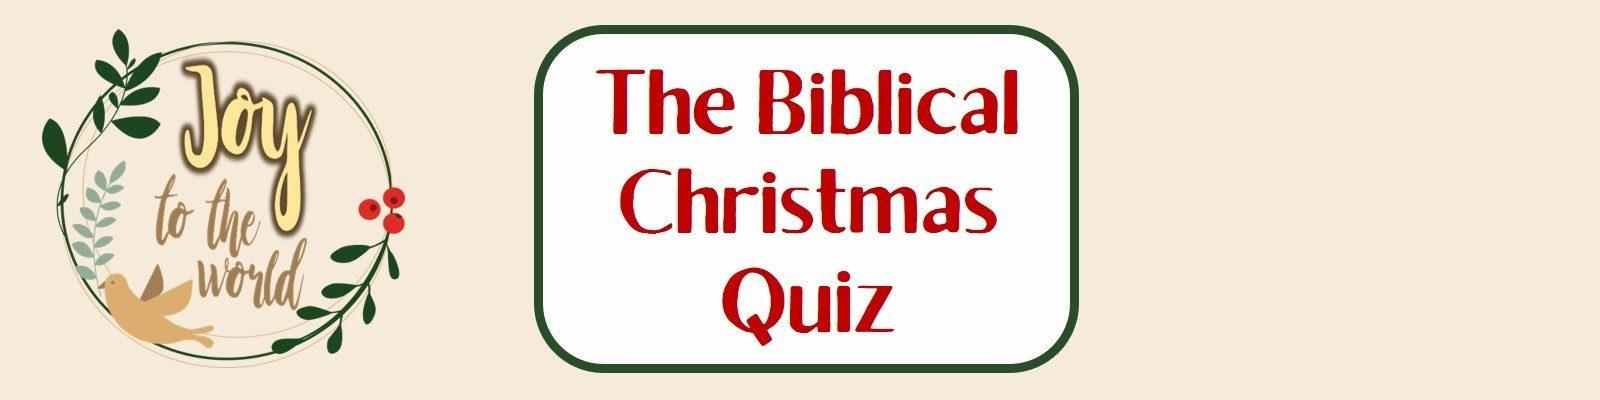 The Christmas Biblical Quiz